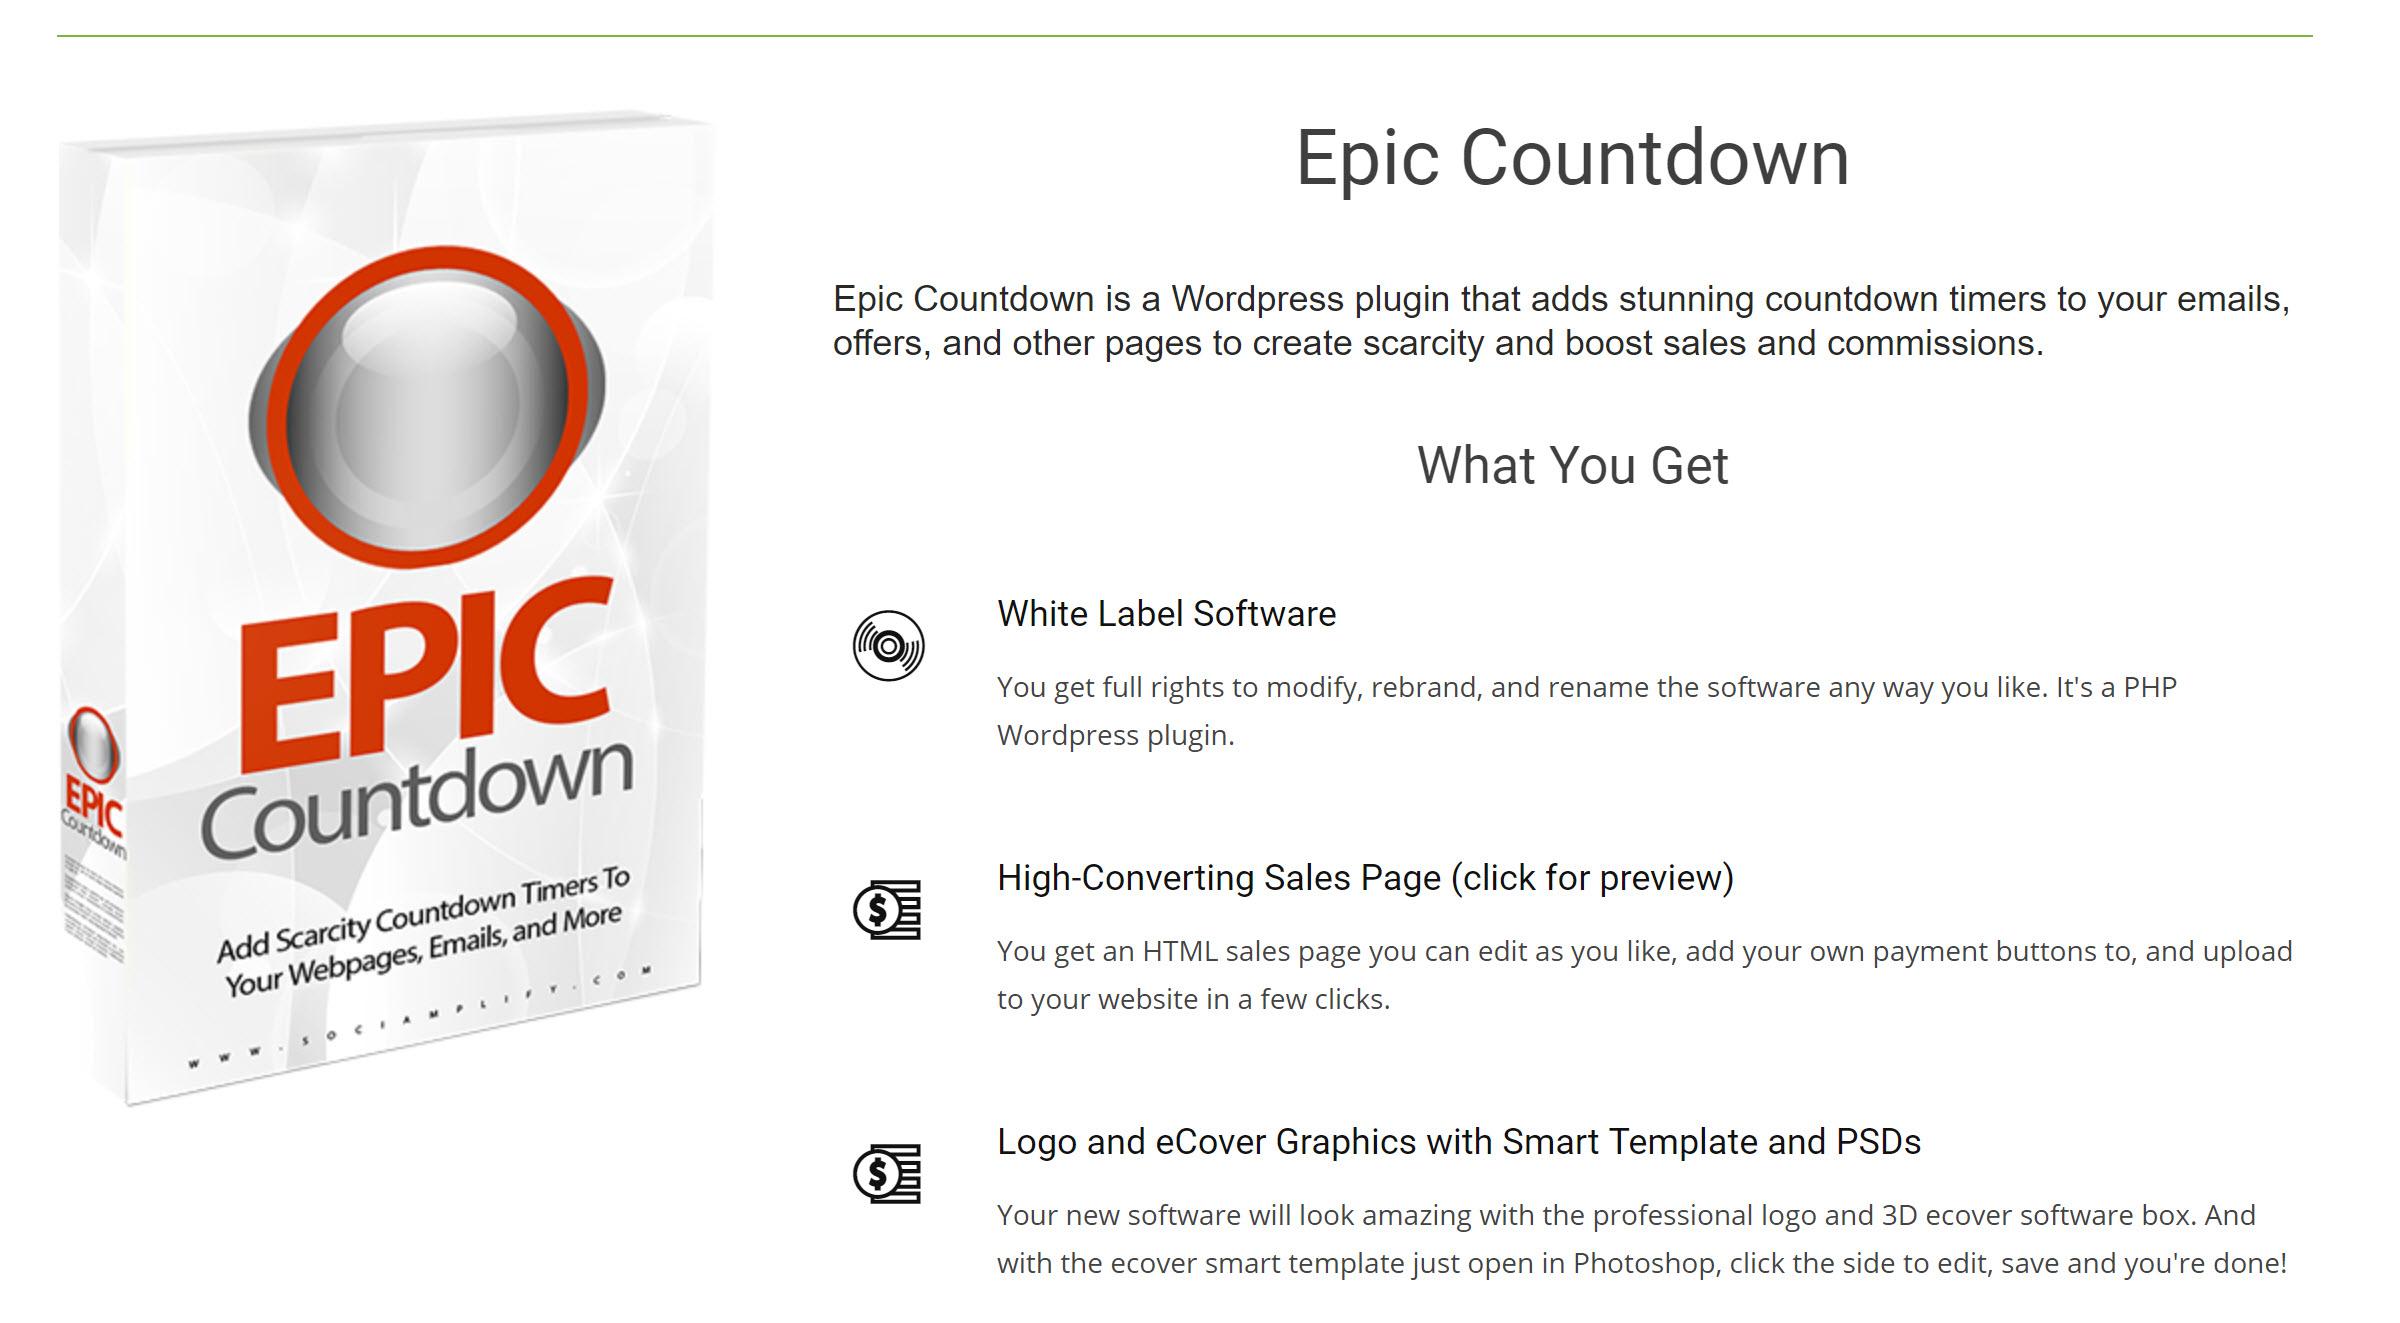 epiccountdown